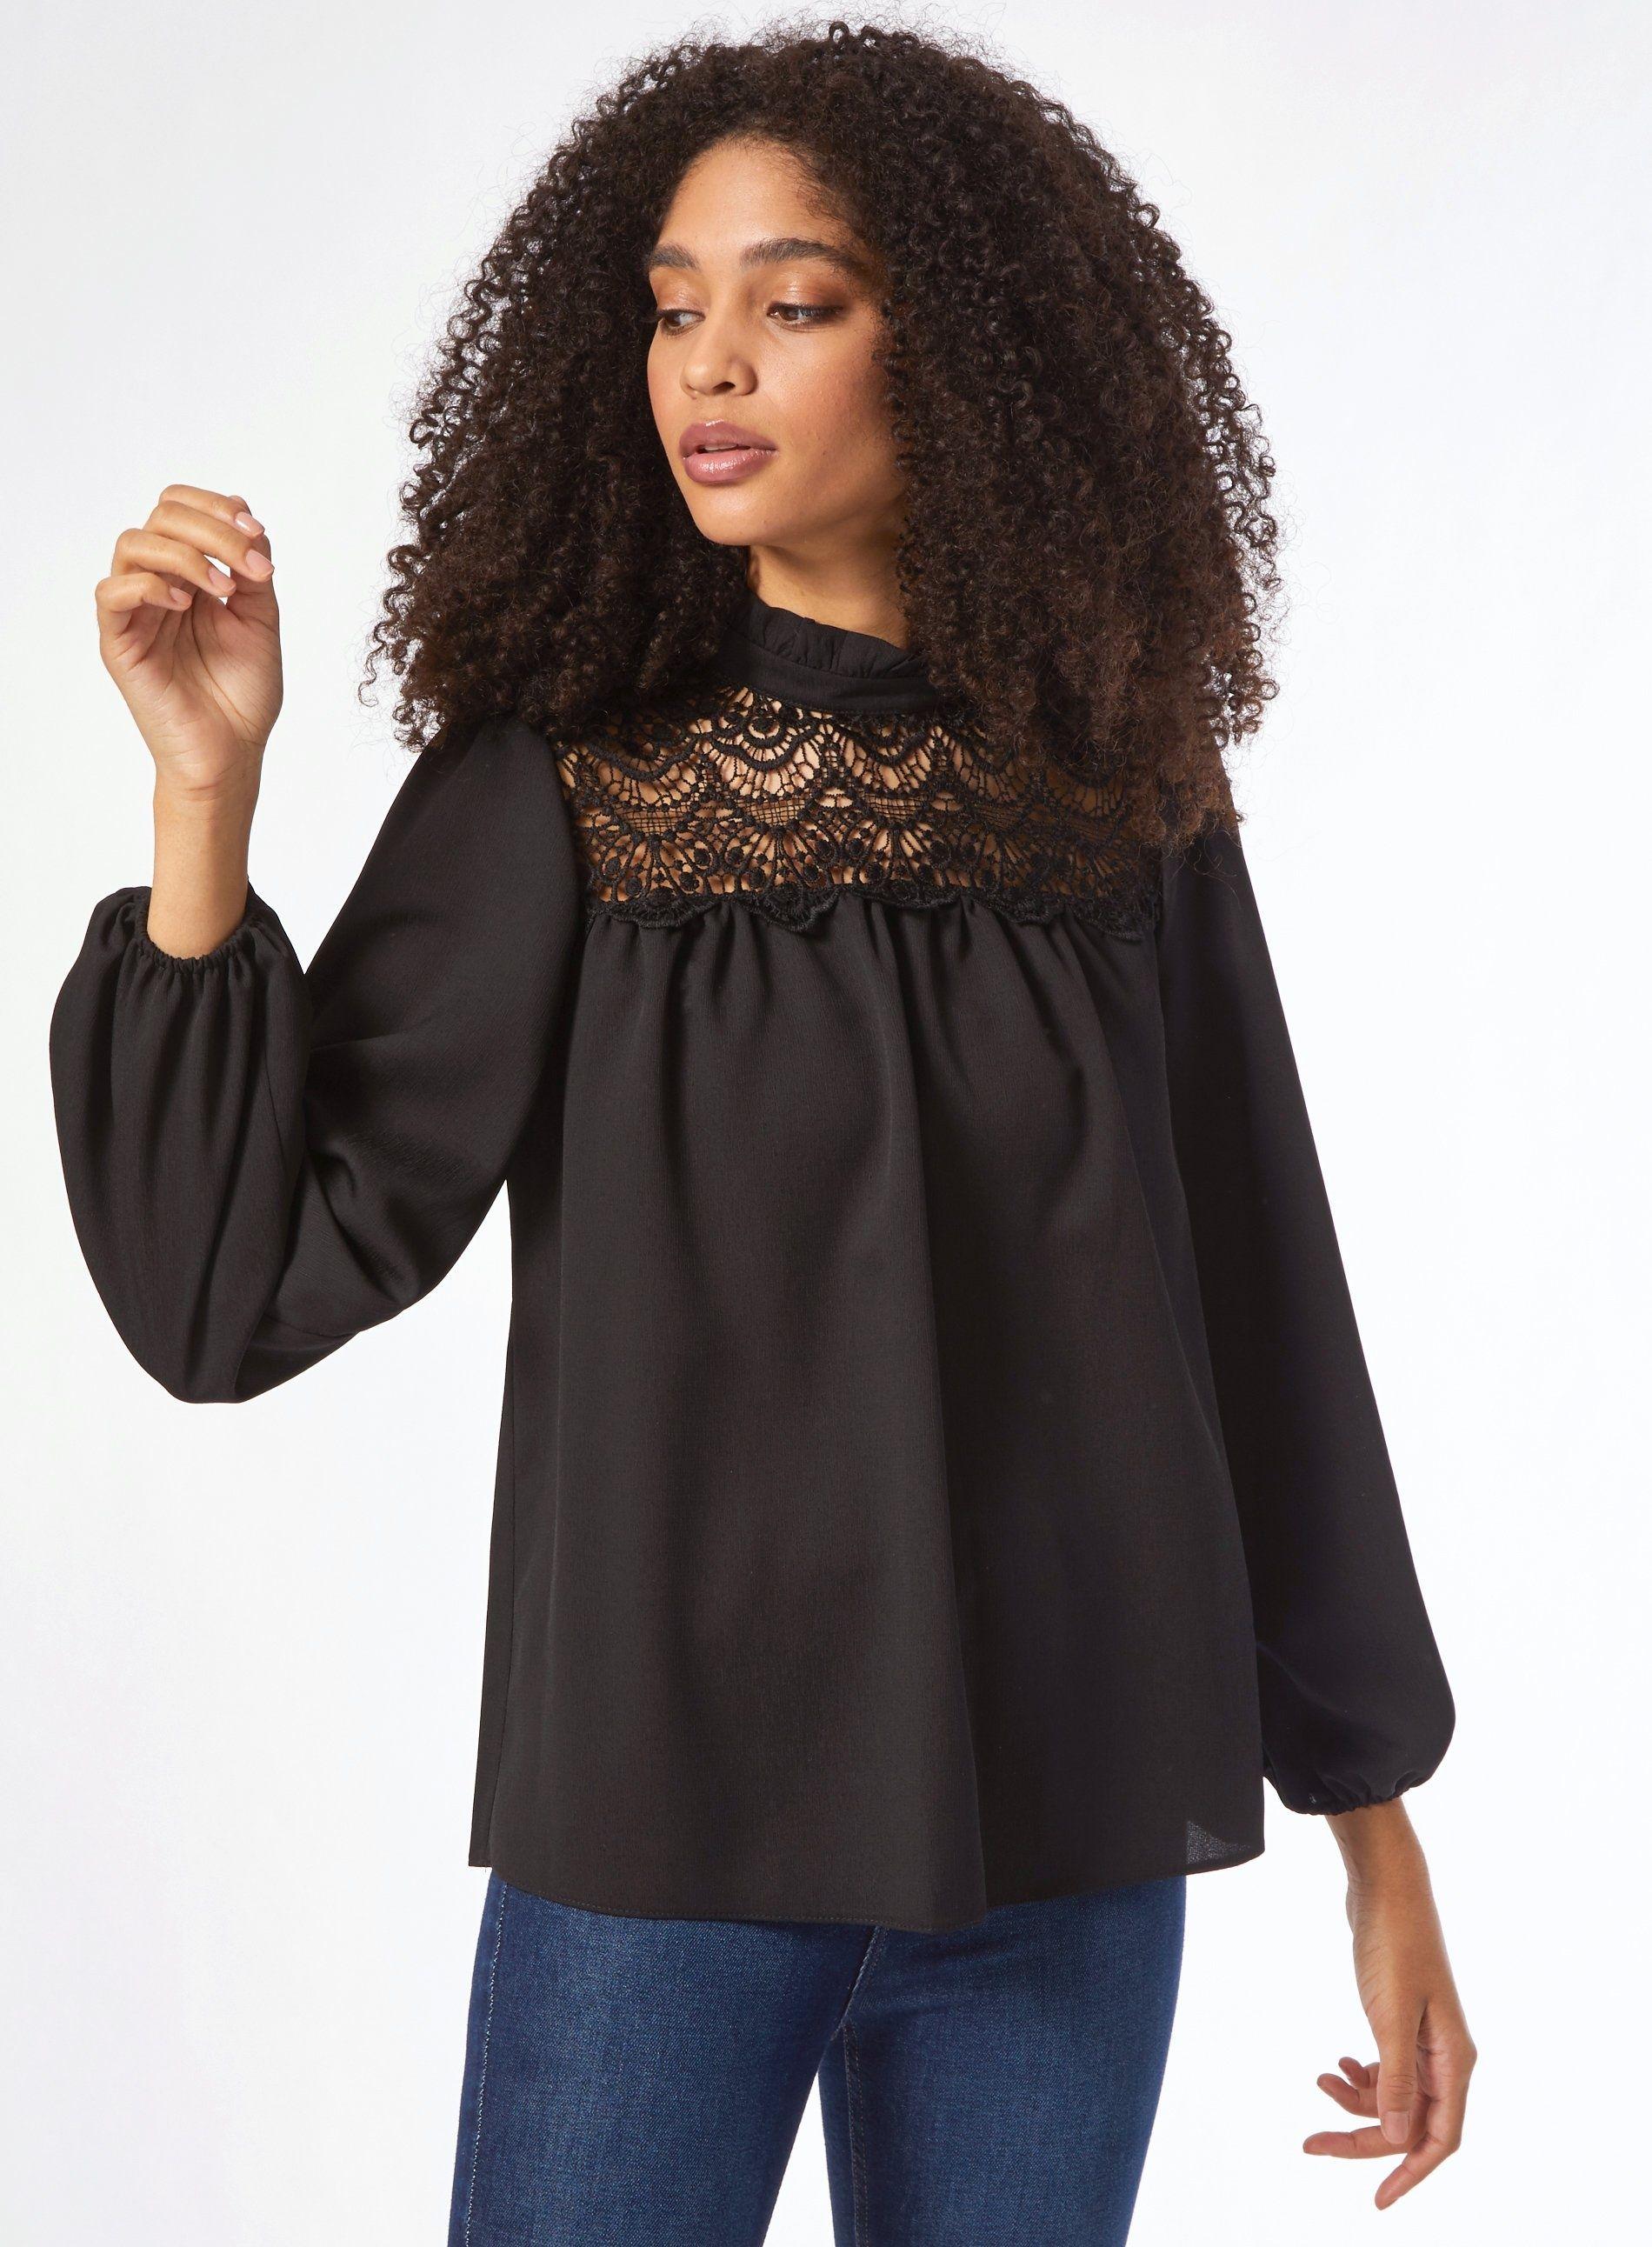 Dorothy Perkins Womens Black Lace Yoke Top 3/4 Sleeve Shirt Blouse Round Neck